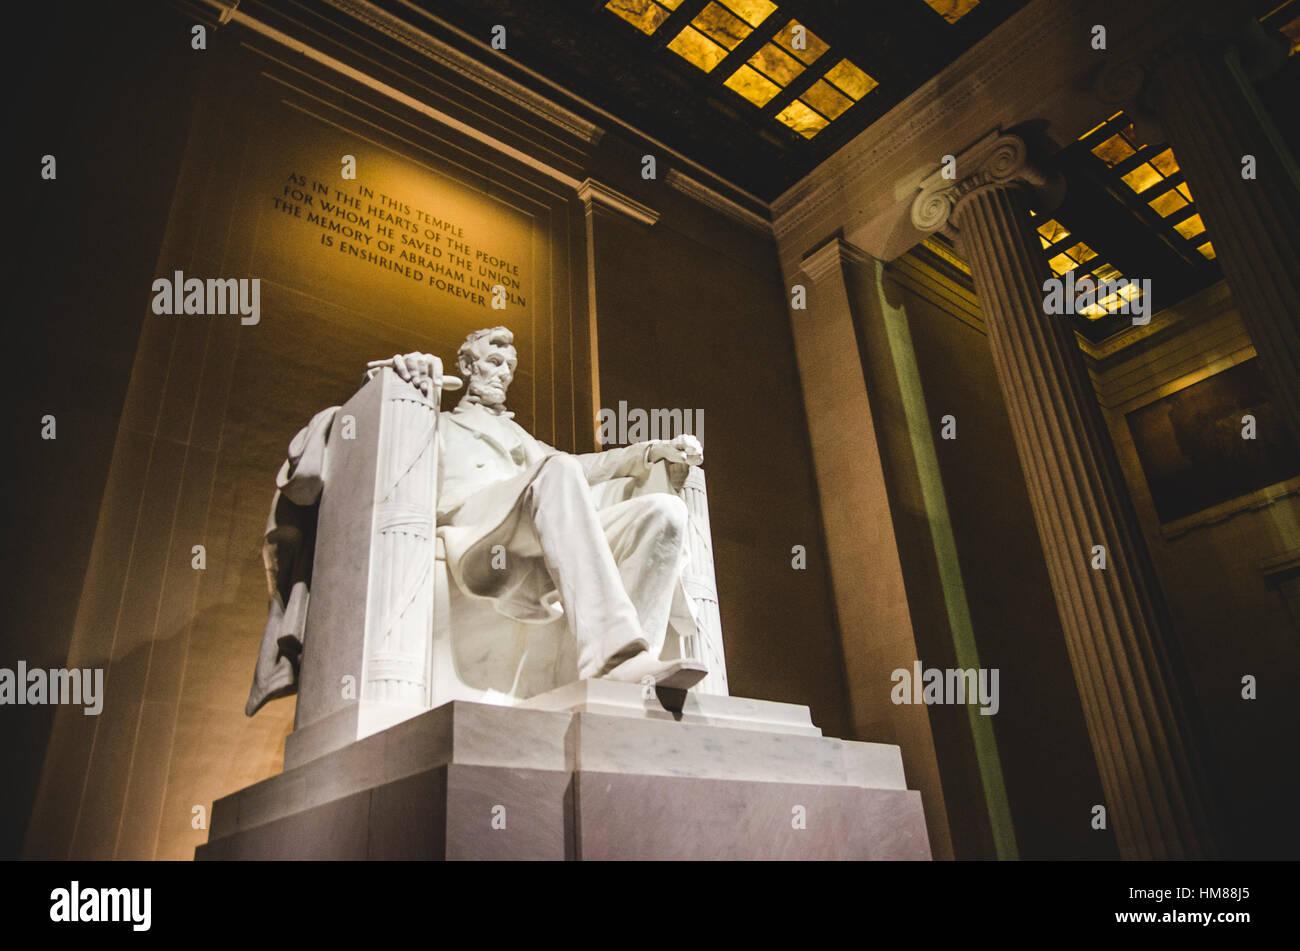 Lincoln Memorial Statue at Night, Low Angle View, Washington, DC, USA - Stock Image